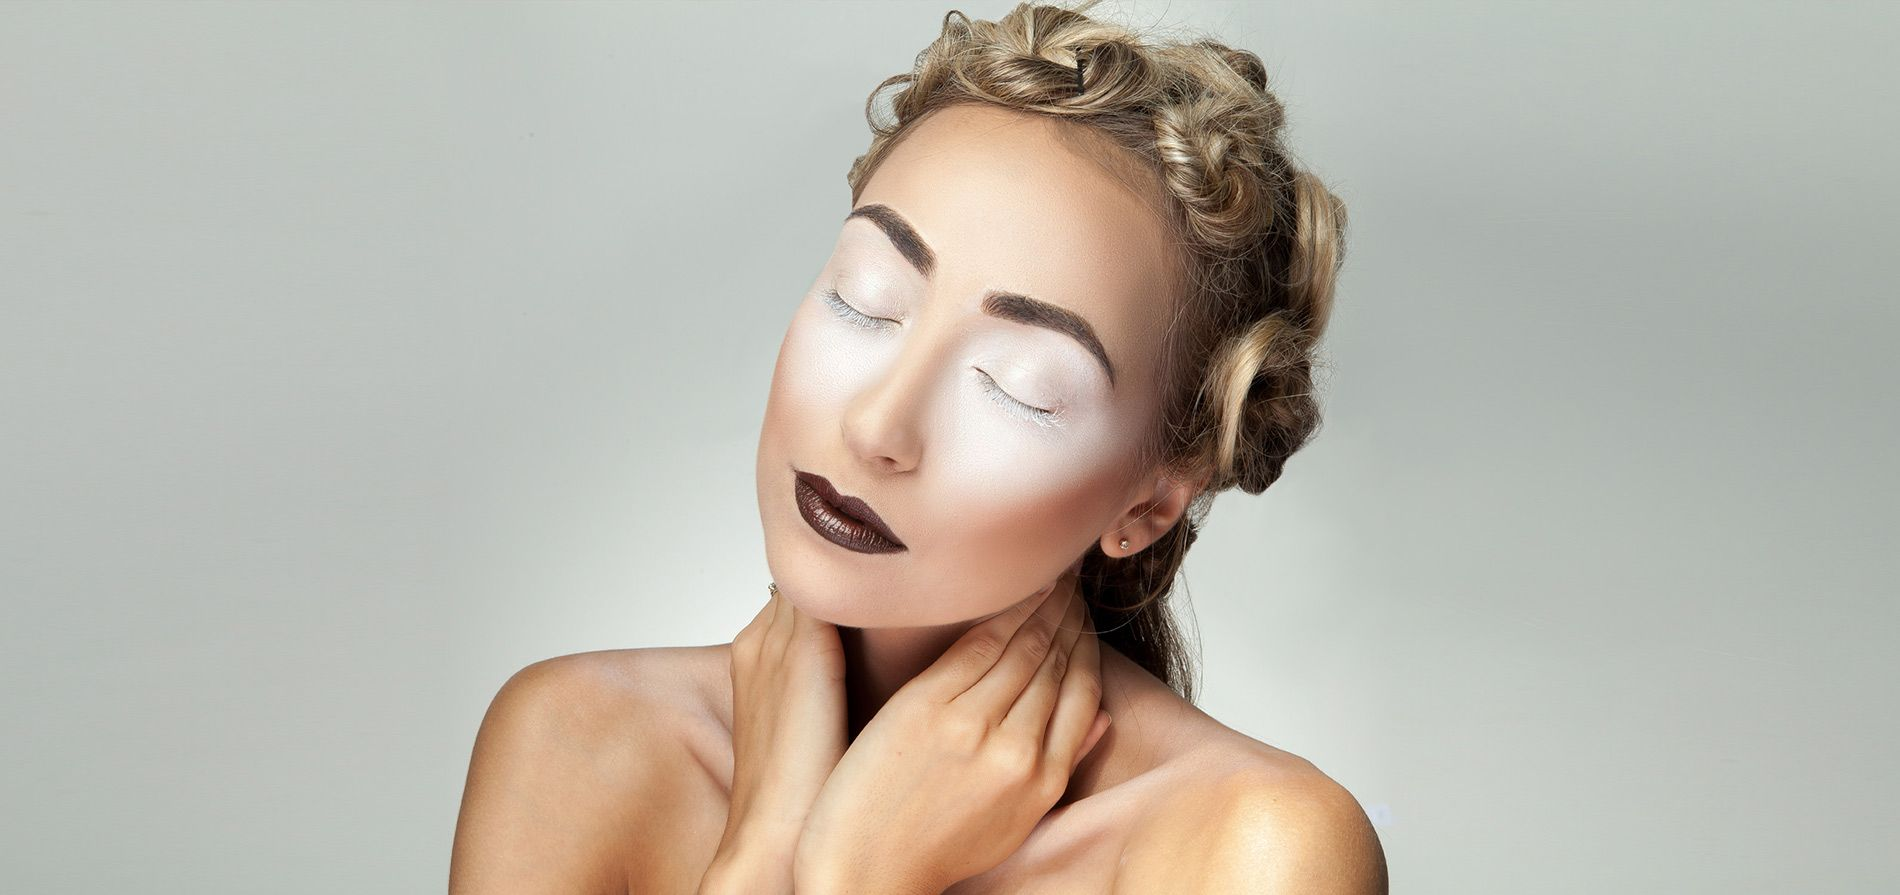 Permanent makeup & Lash Extensions Studio Store & Training